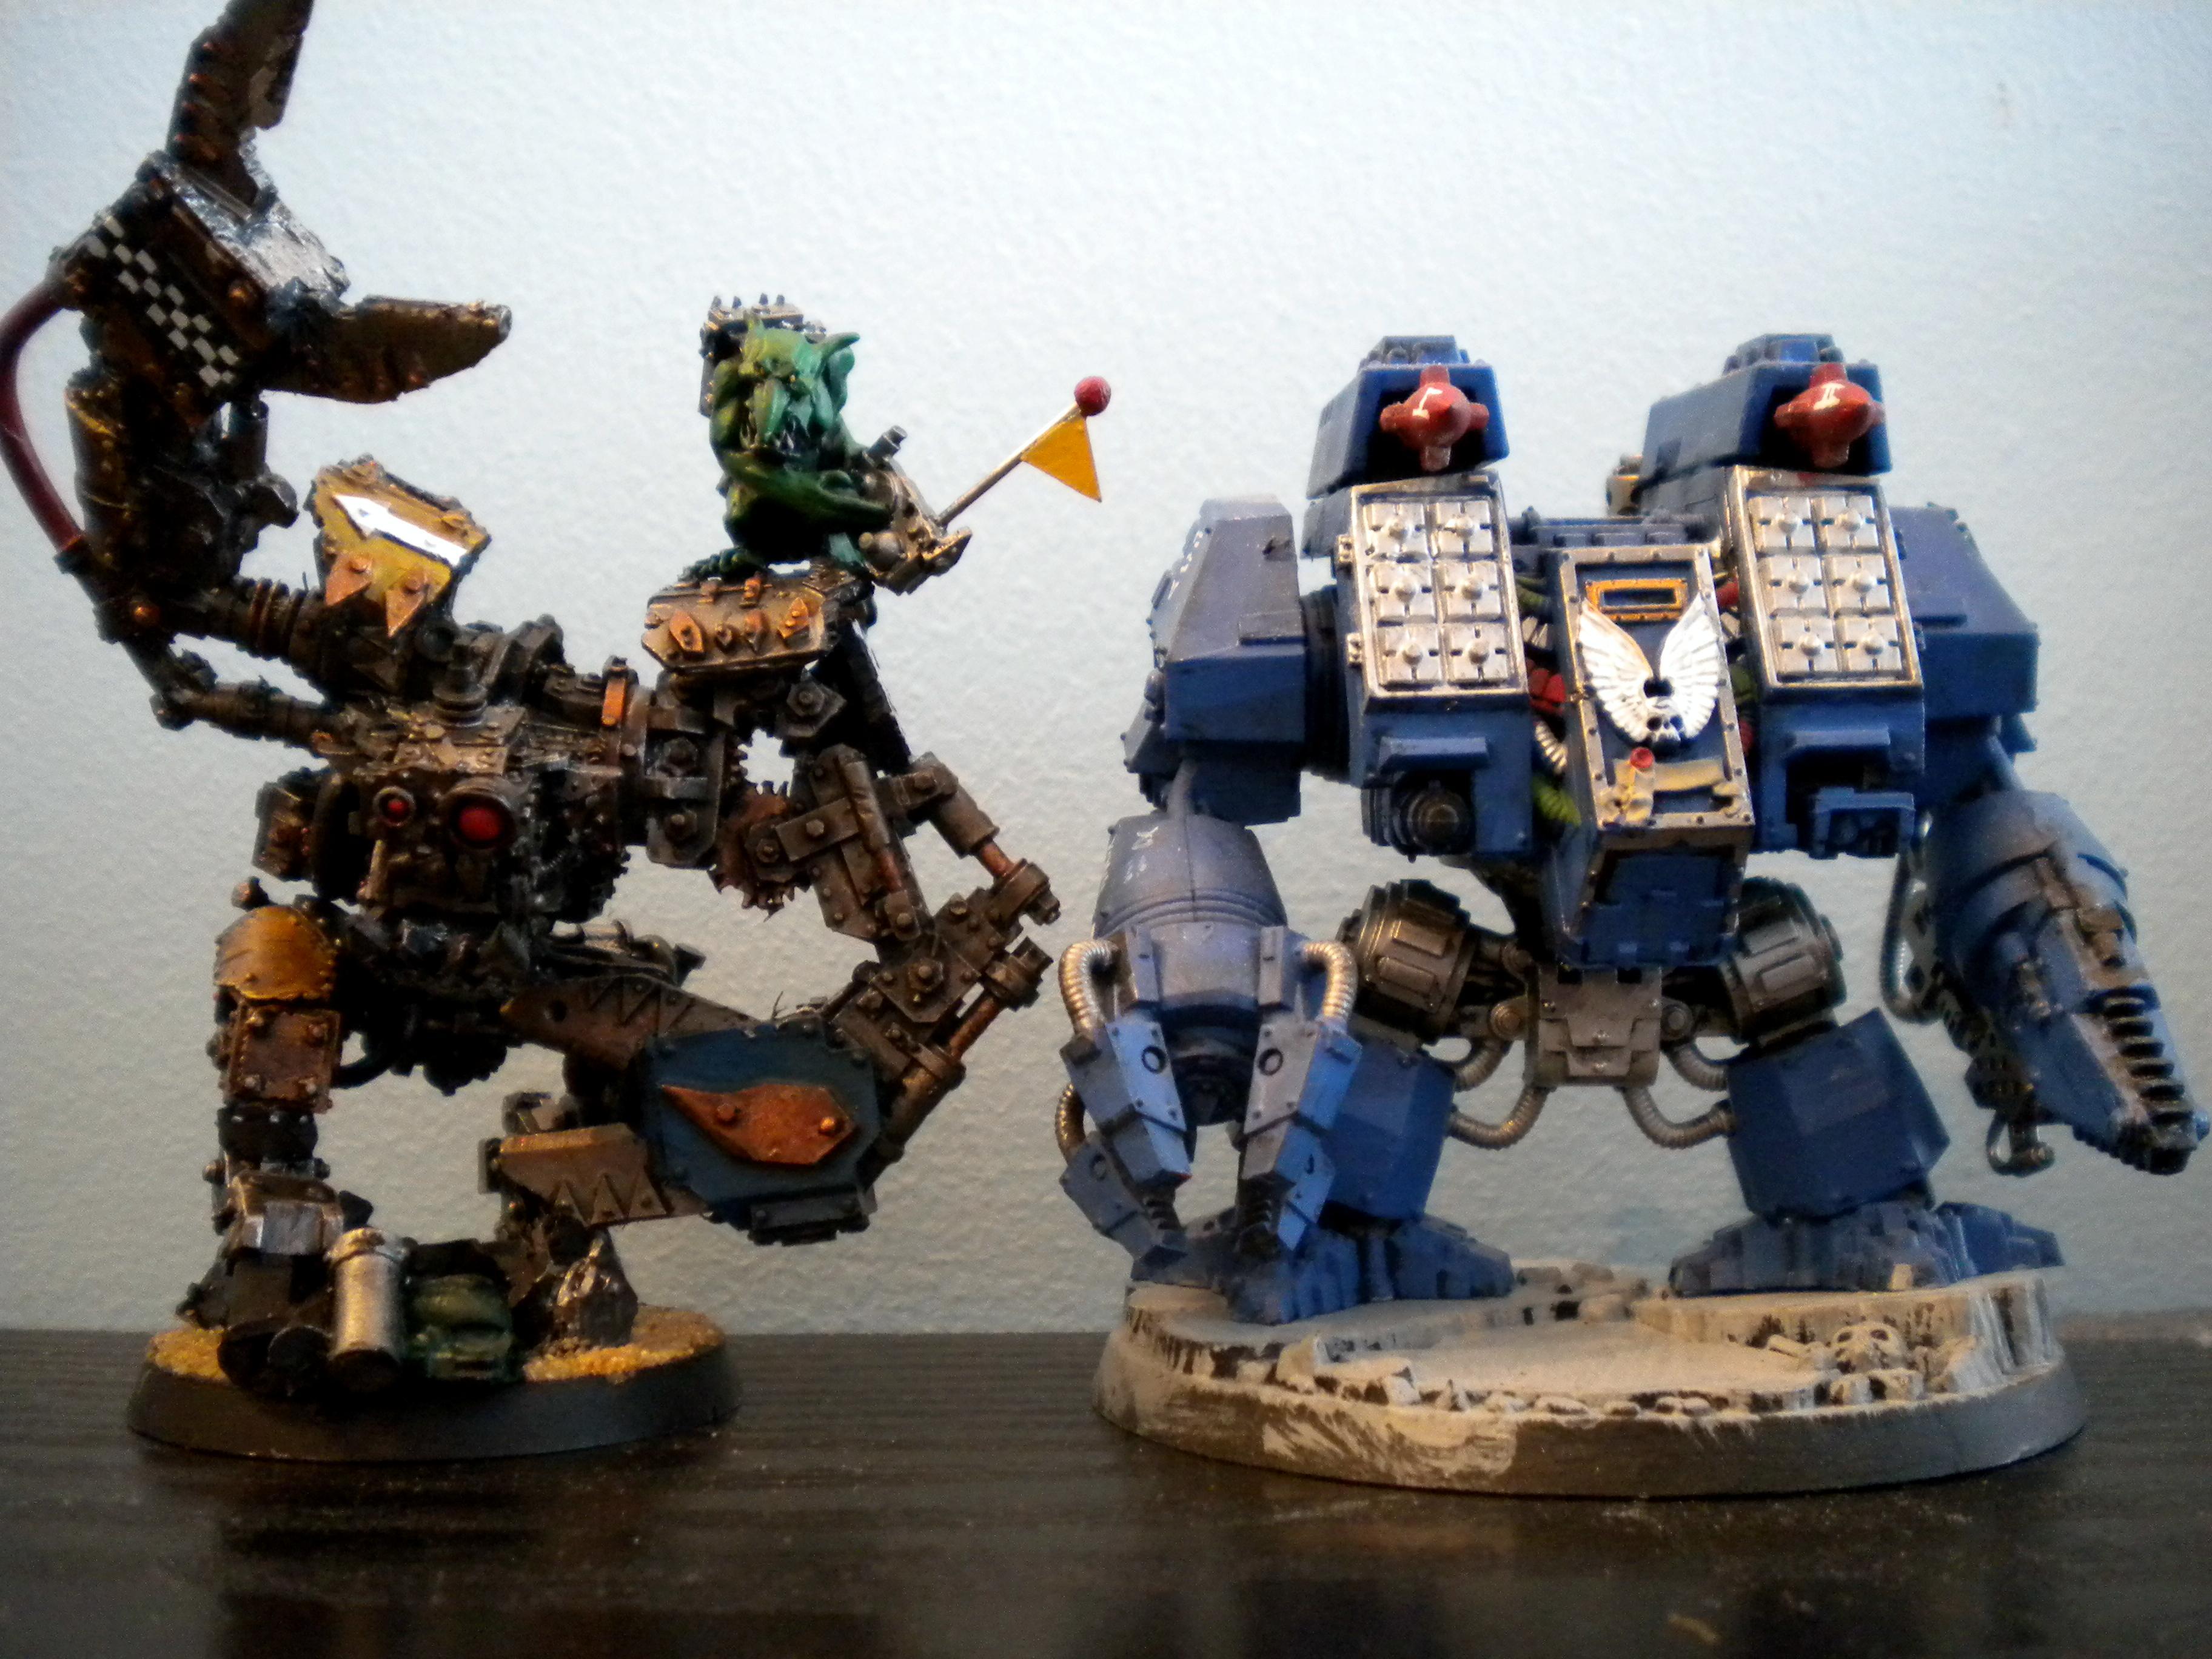 Ironclad, Runt Bot, Venerable Dreadnaught